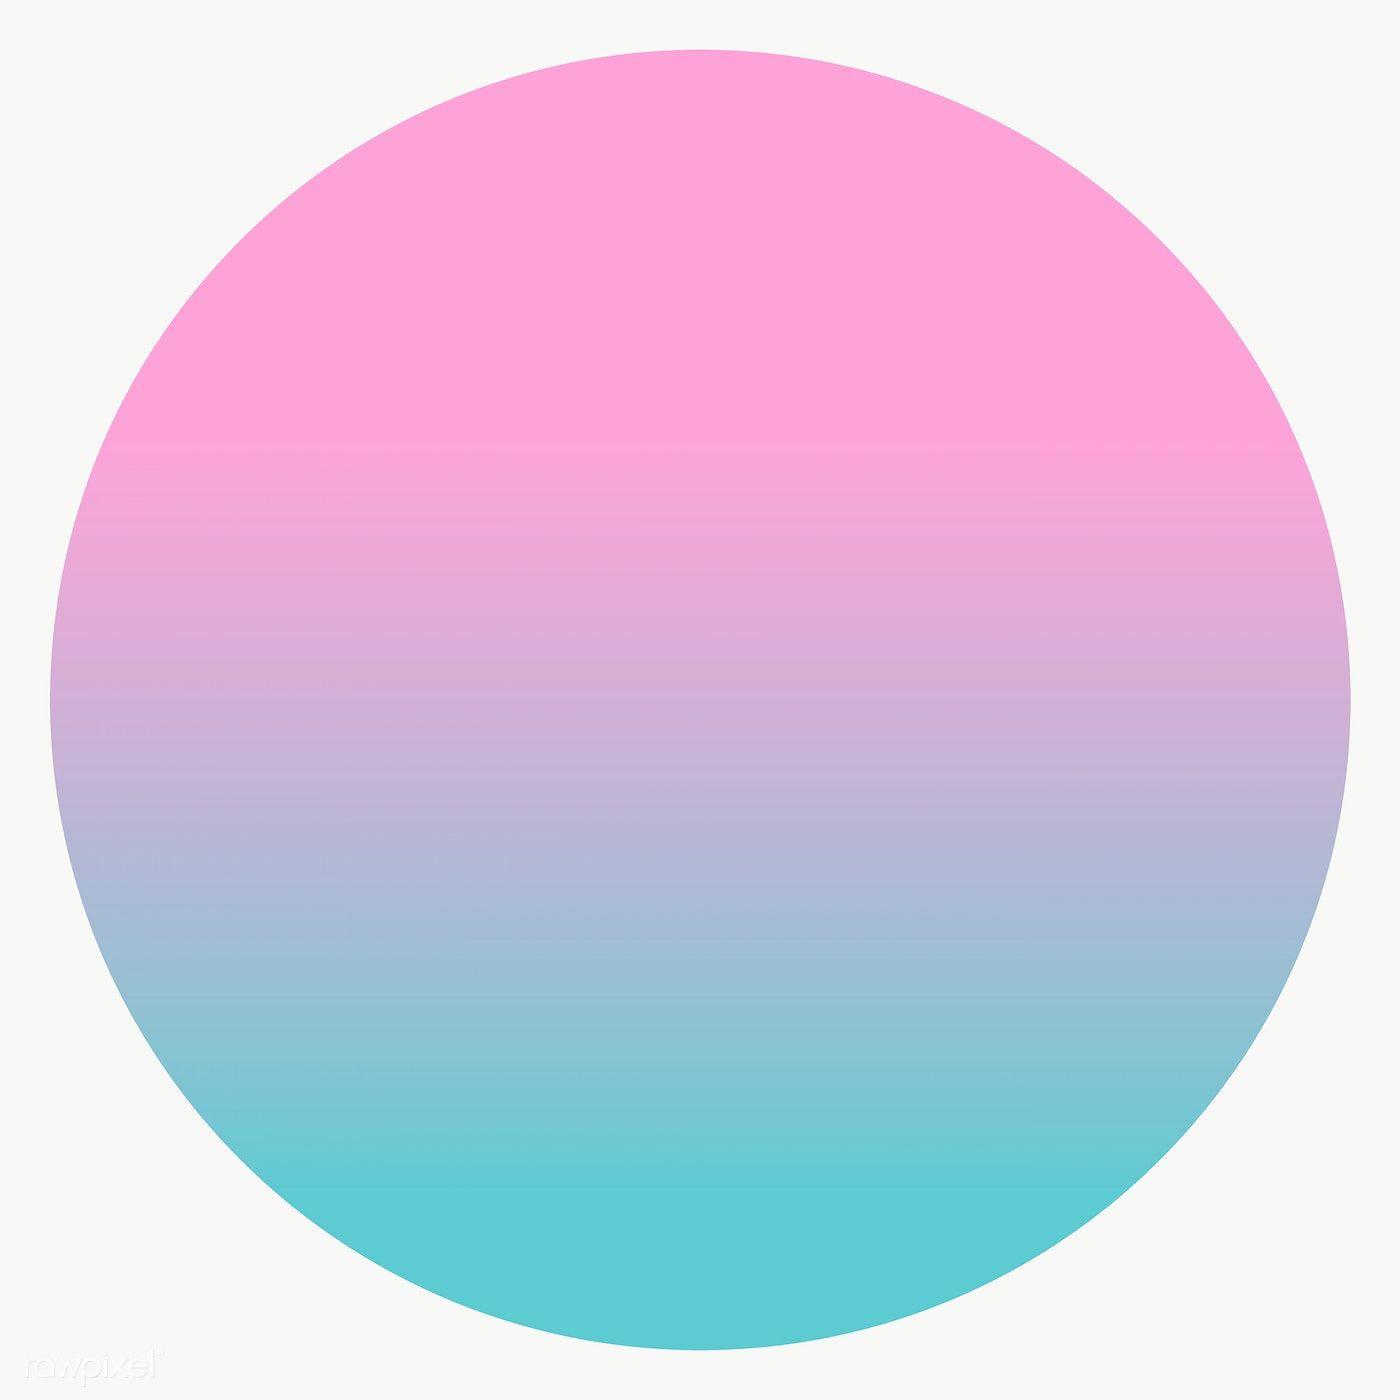 Colorful Round Gradient Element Transparent Png Premium Image By Rawpixel Com Nunny Print Stickers Gradient Design Graphic Design Art